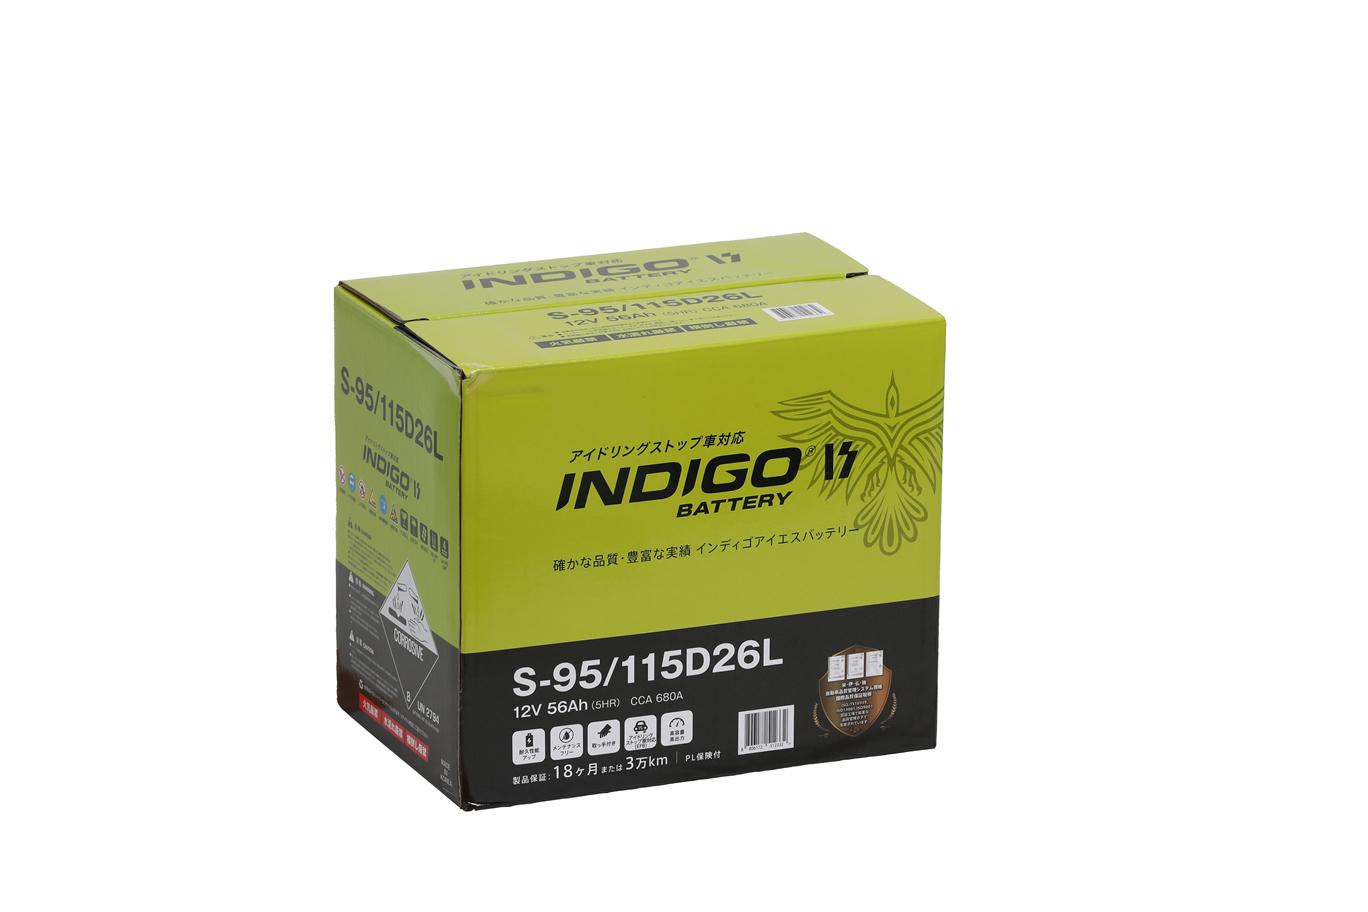 INDIGO インディゴ アイエスバッテリー S-95/115D26L (L端子のみ) アイドリングストップ車対応バッテリー